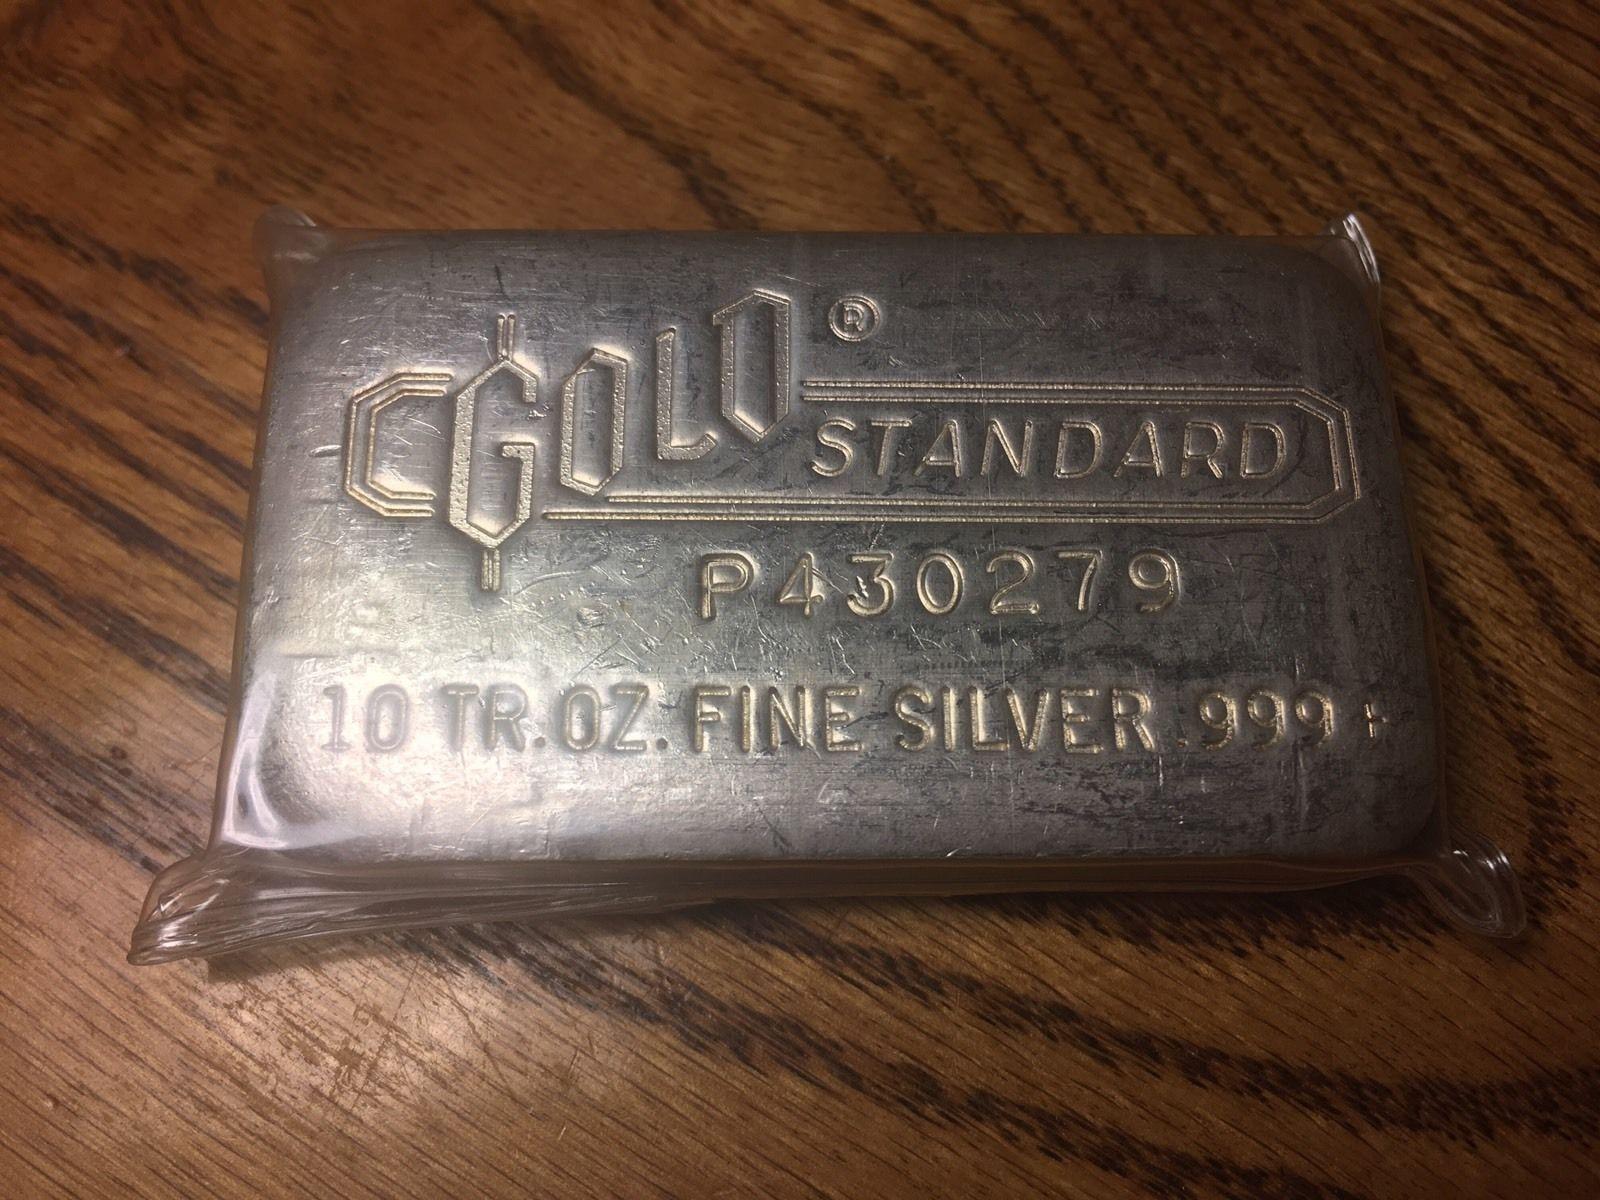 Engelhard 10 Troy Oz 999 Silver Poured Bar Gold Standard Seldom Seen For Sale Silver Silver Bars Gold